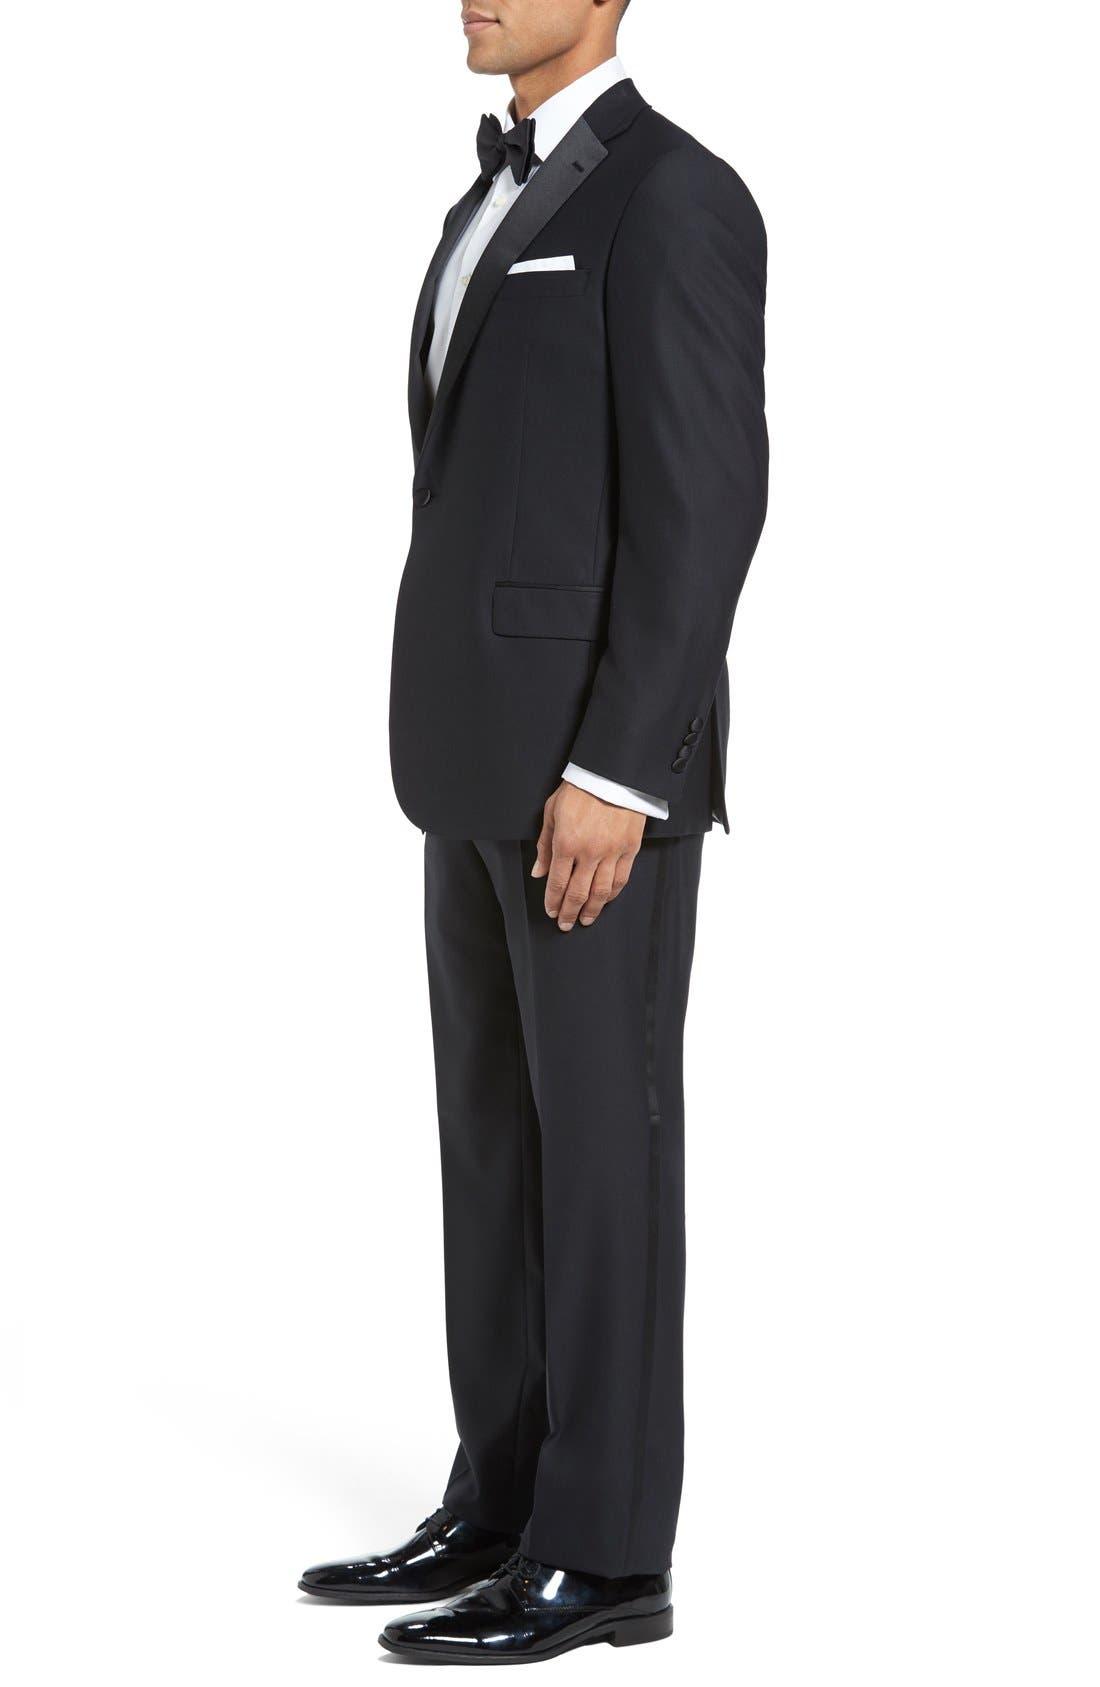 New York Classic Fit Black Wool Tuxedo,                             Alternate thumbnail 3, color,                             BLACK